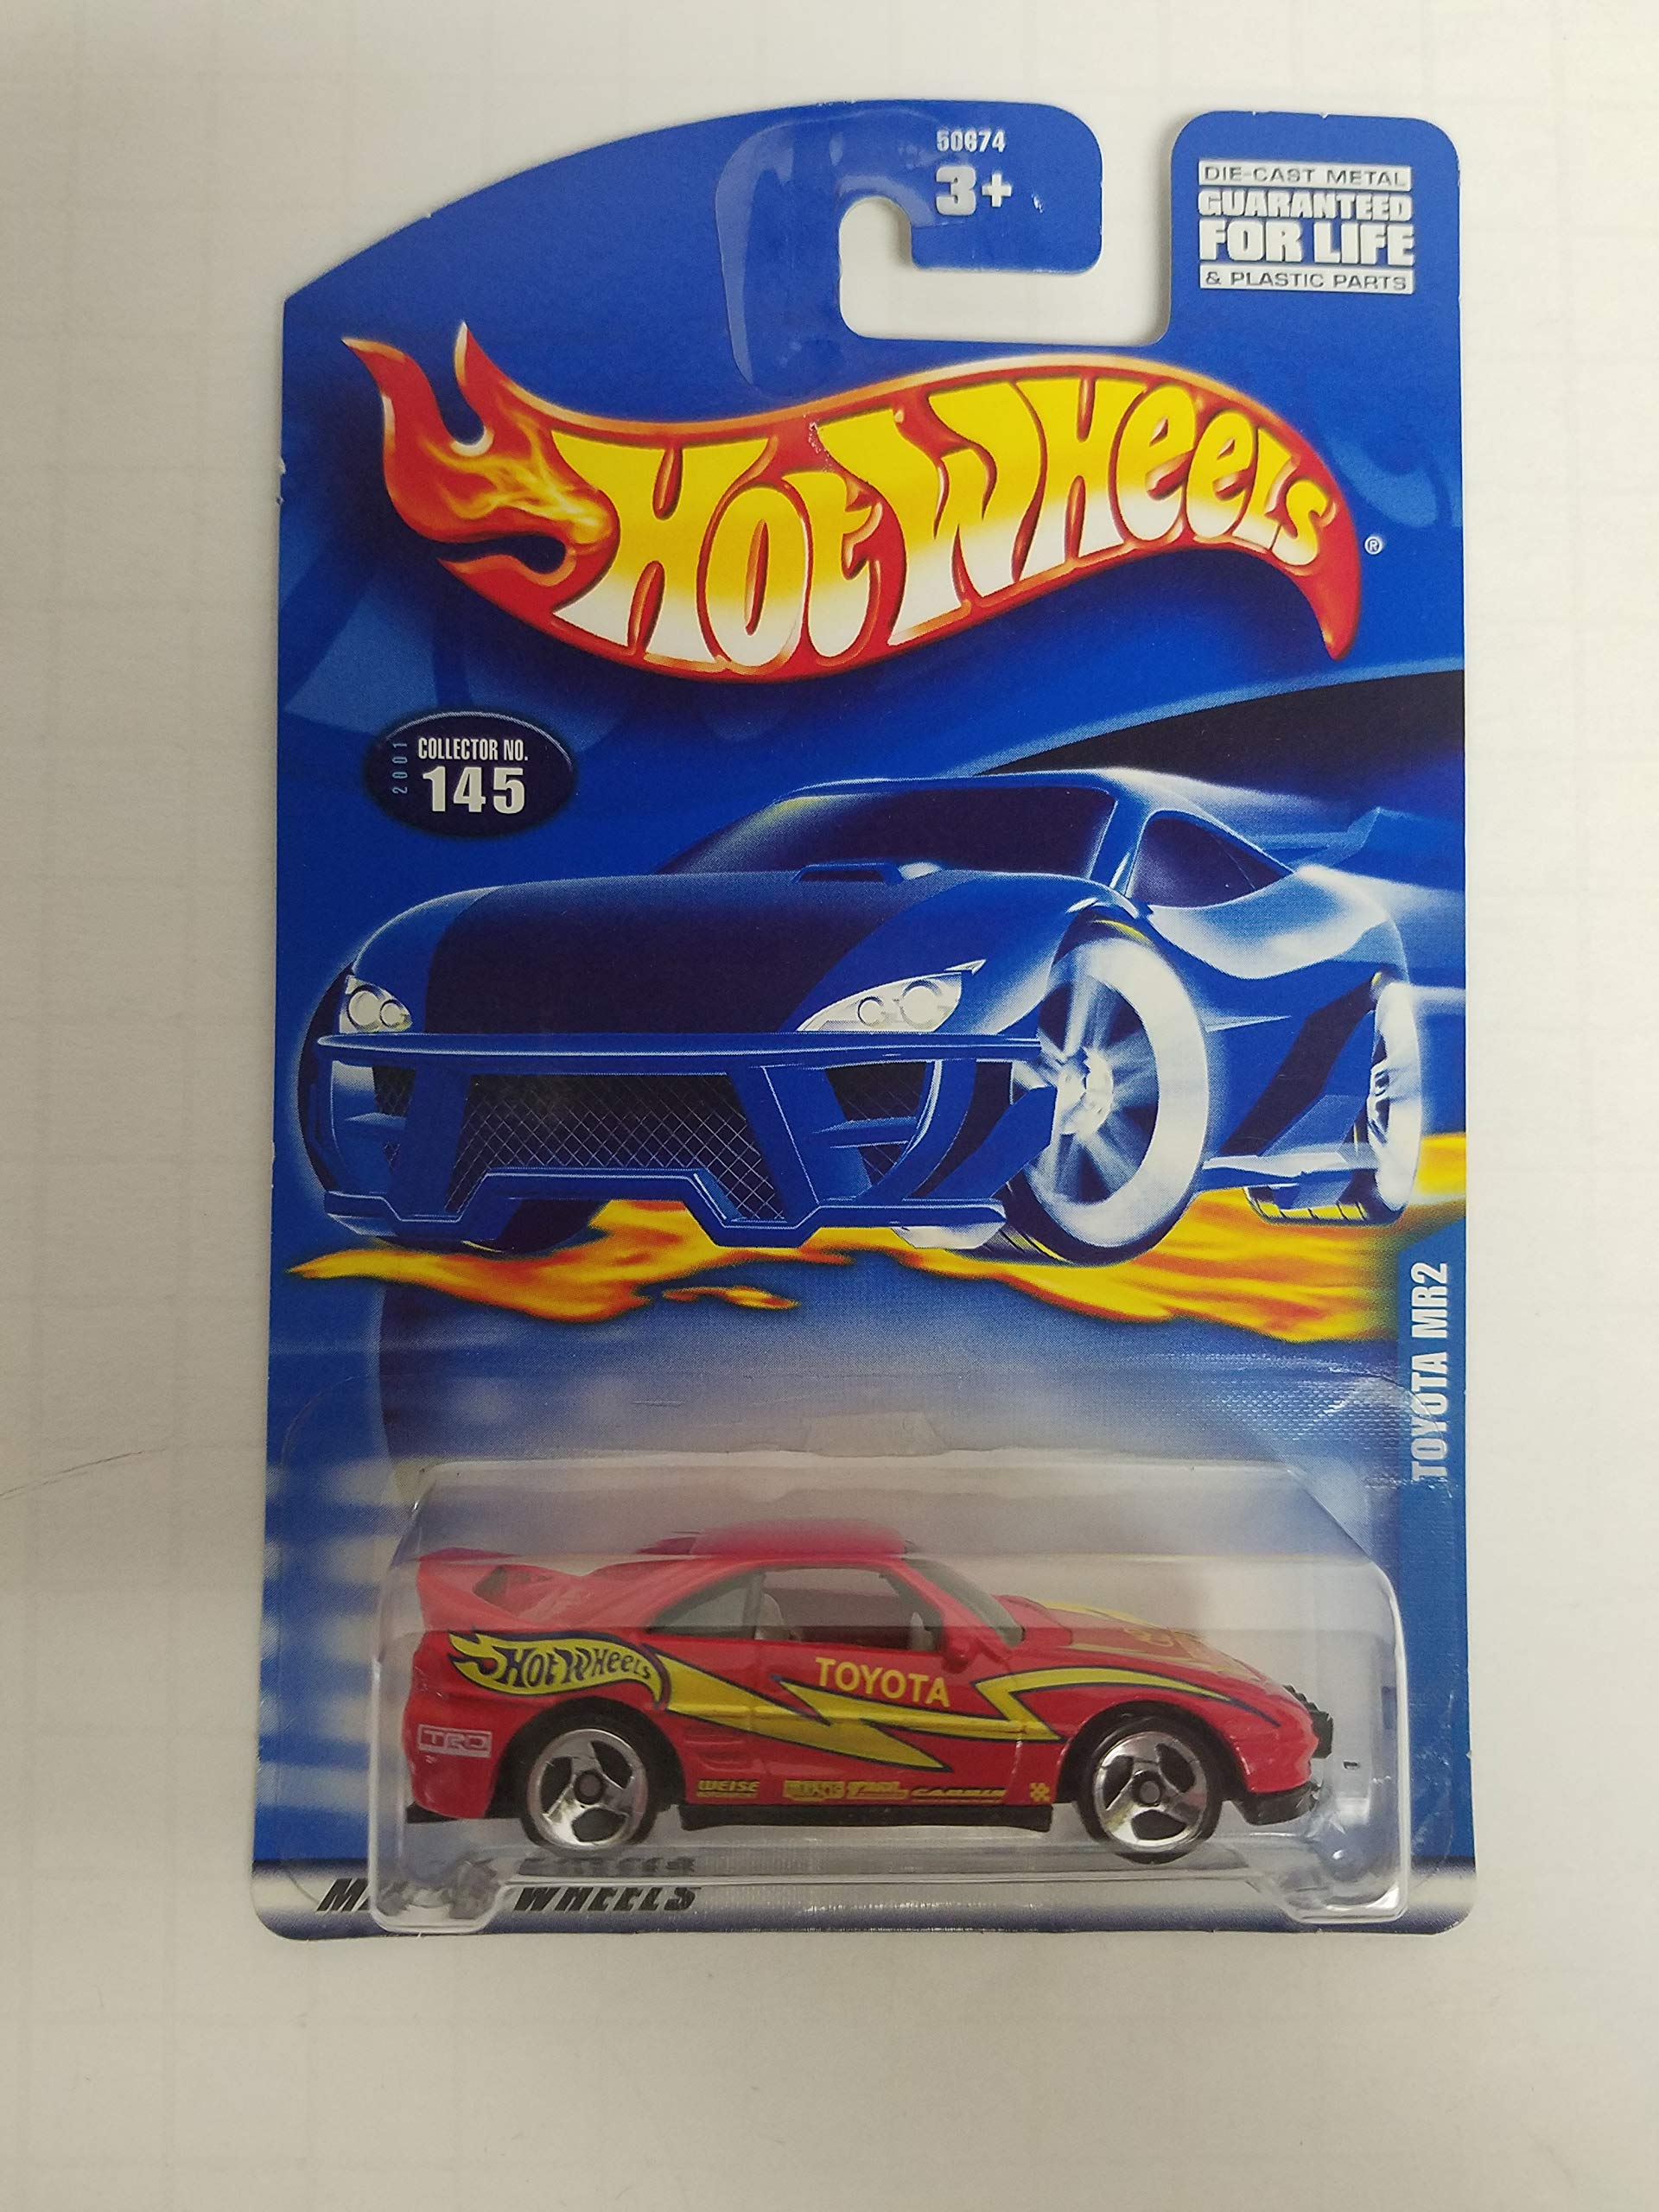 Toyota MR2 Hot Wheels 2001 diecast 1/64 scale car No. 145